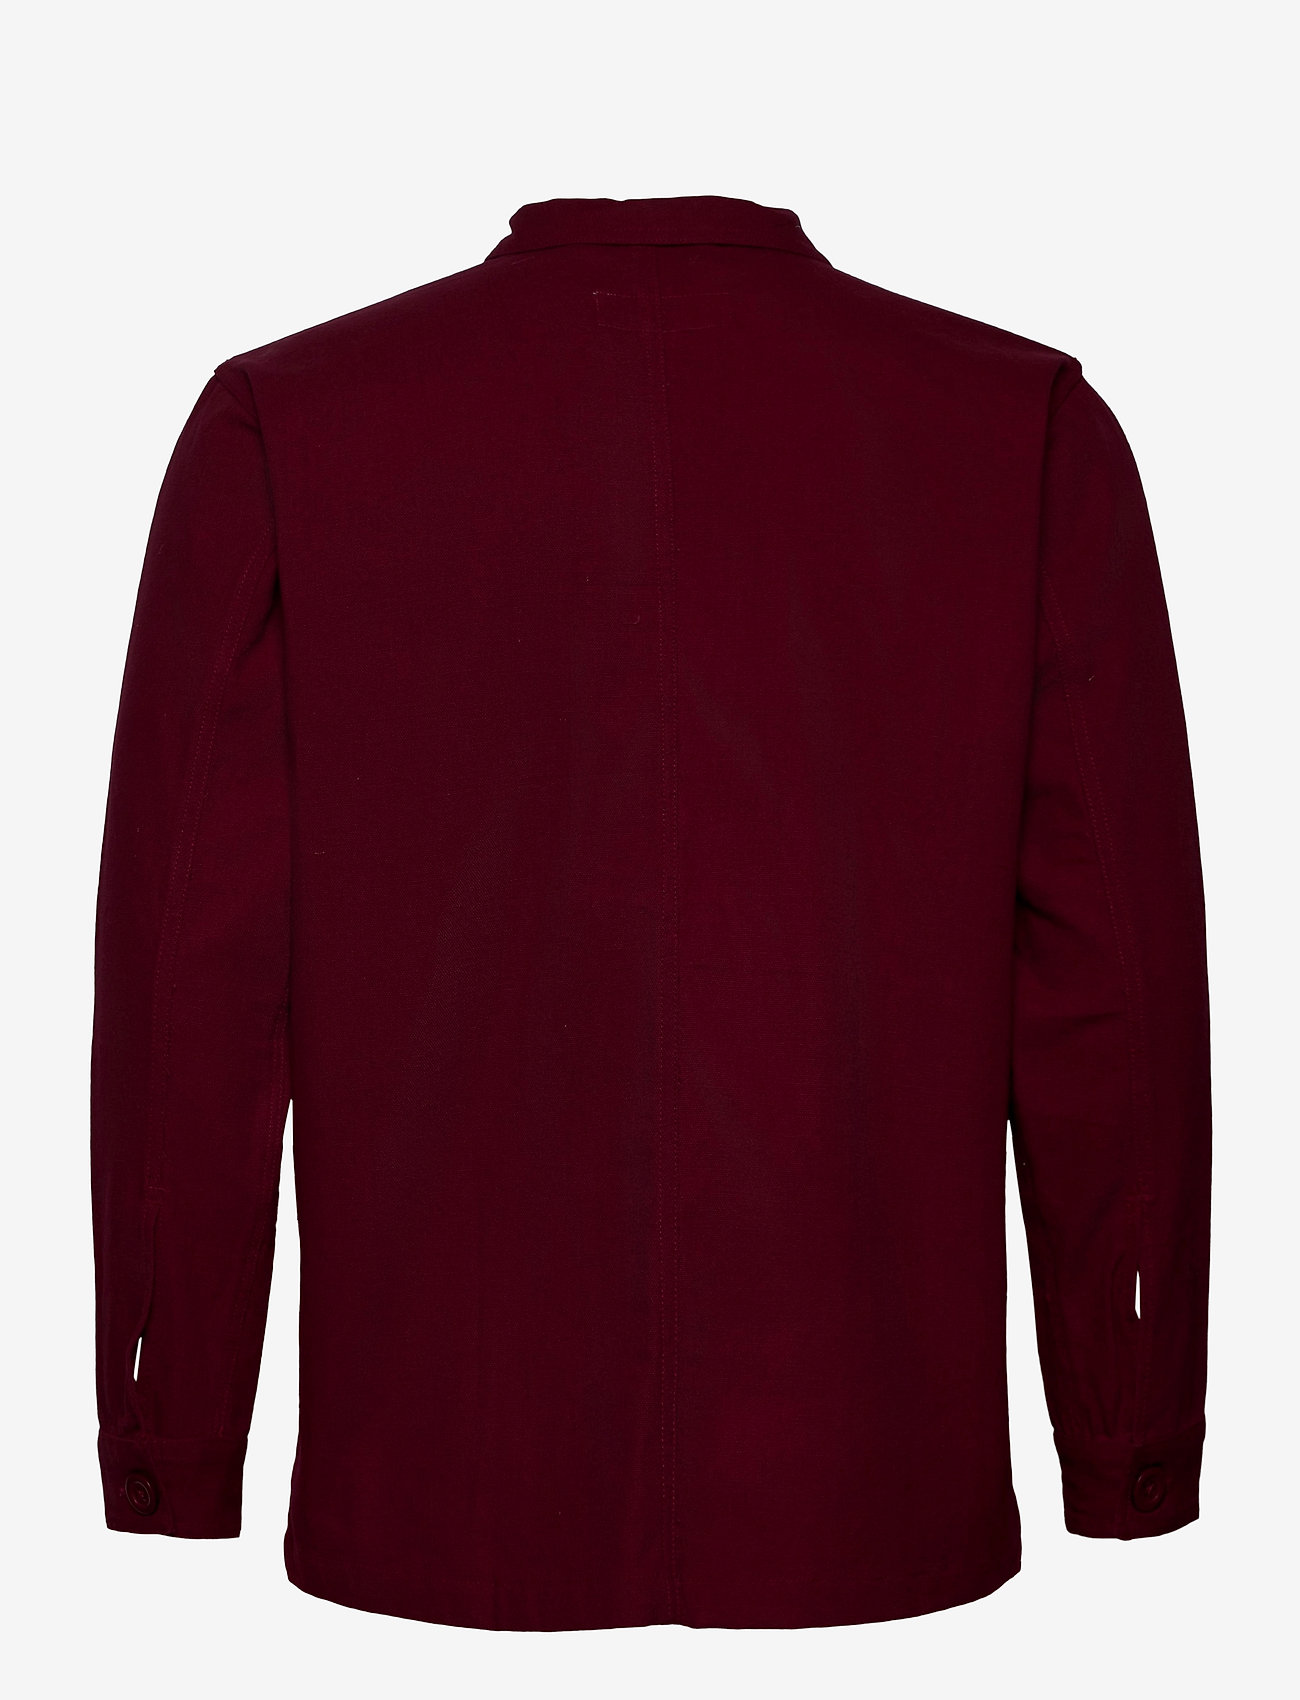 Worker Jacket Sala (Burgundy) (59.98 €) - DEDICATED Xce2a